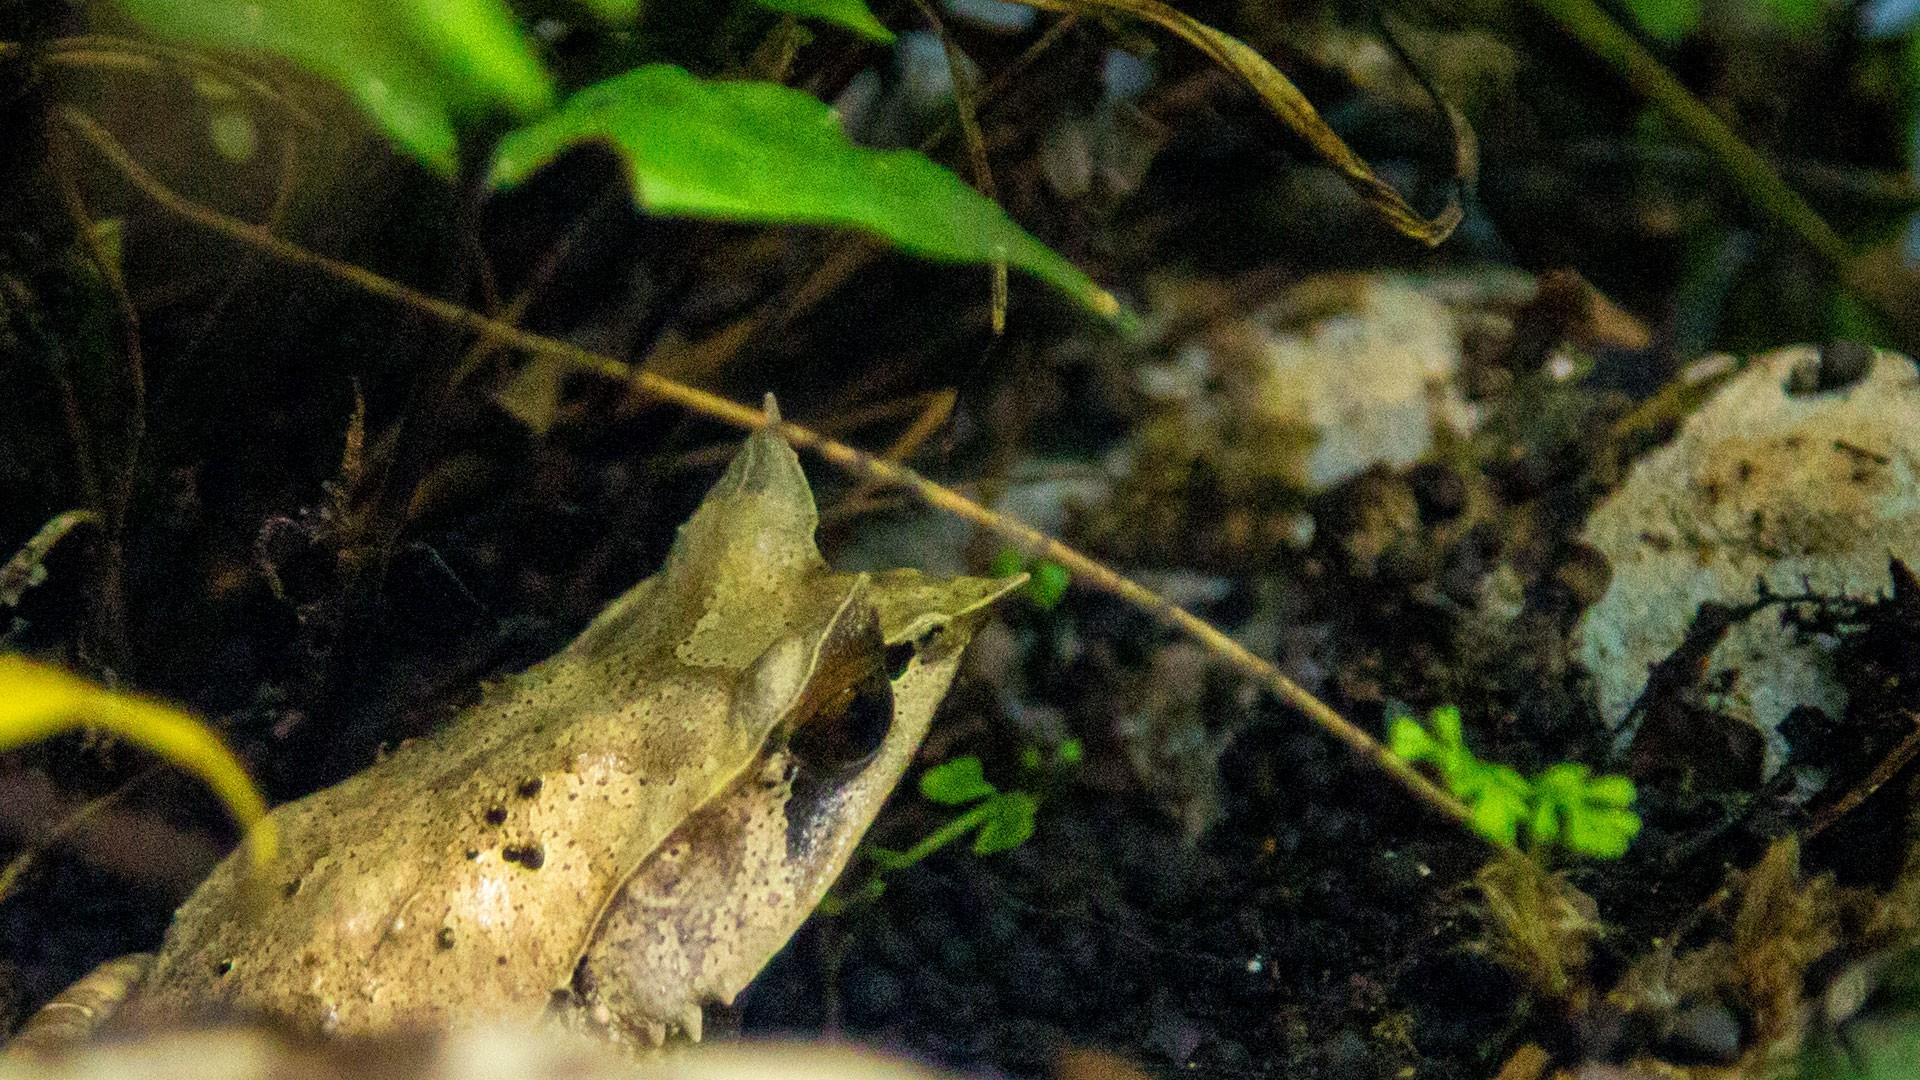 Zipfelkrötenfrosch